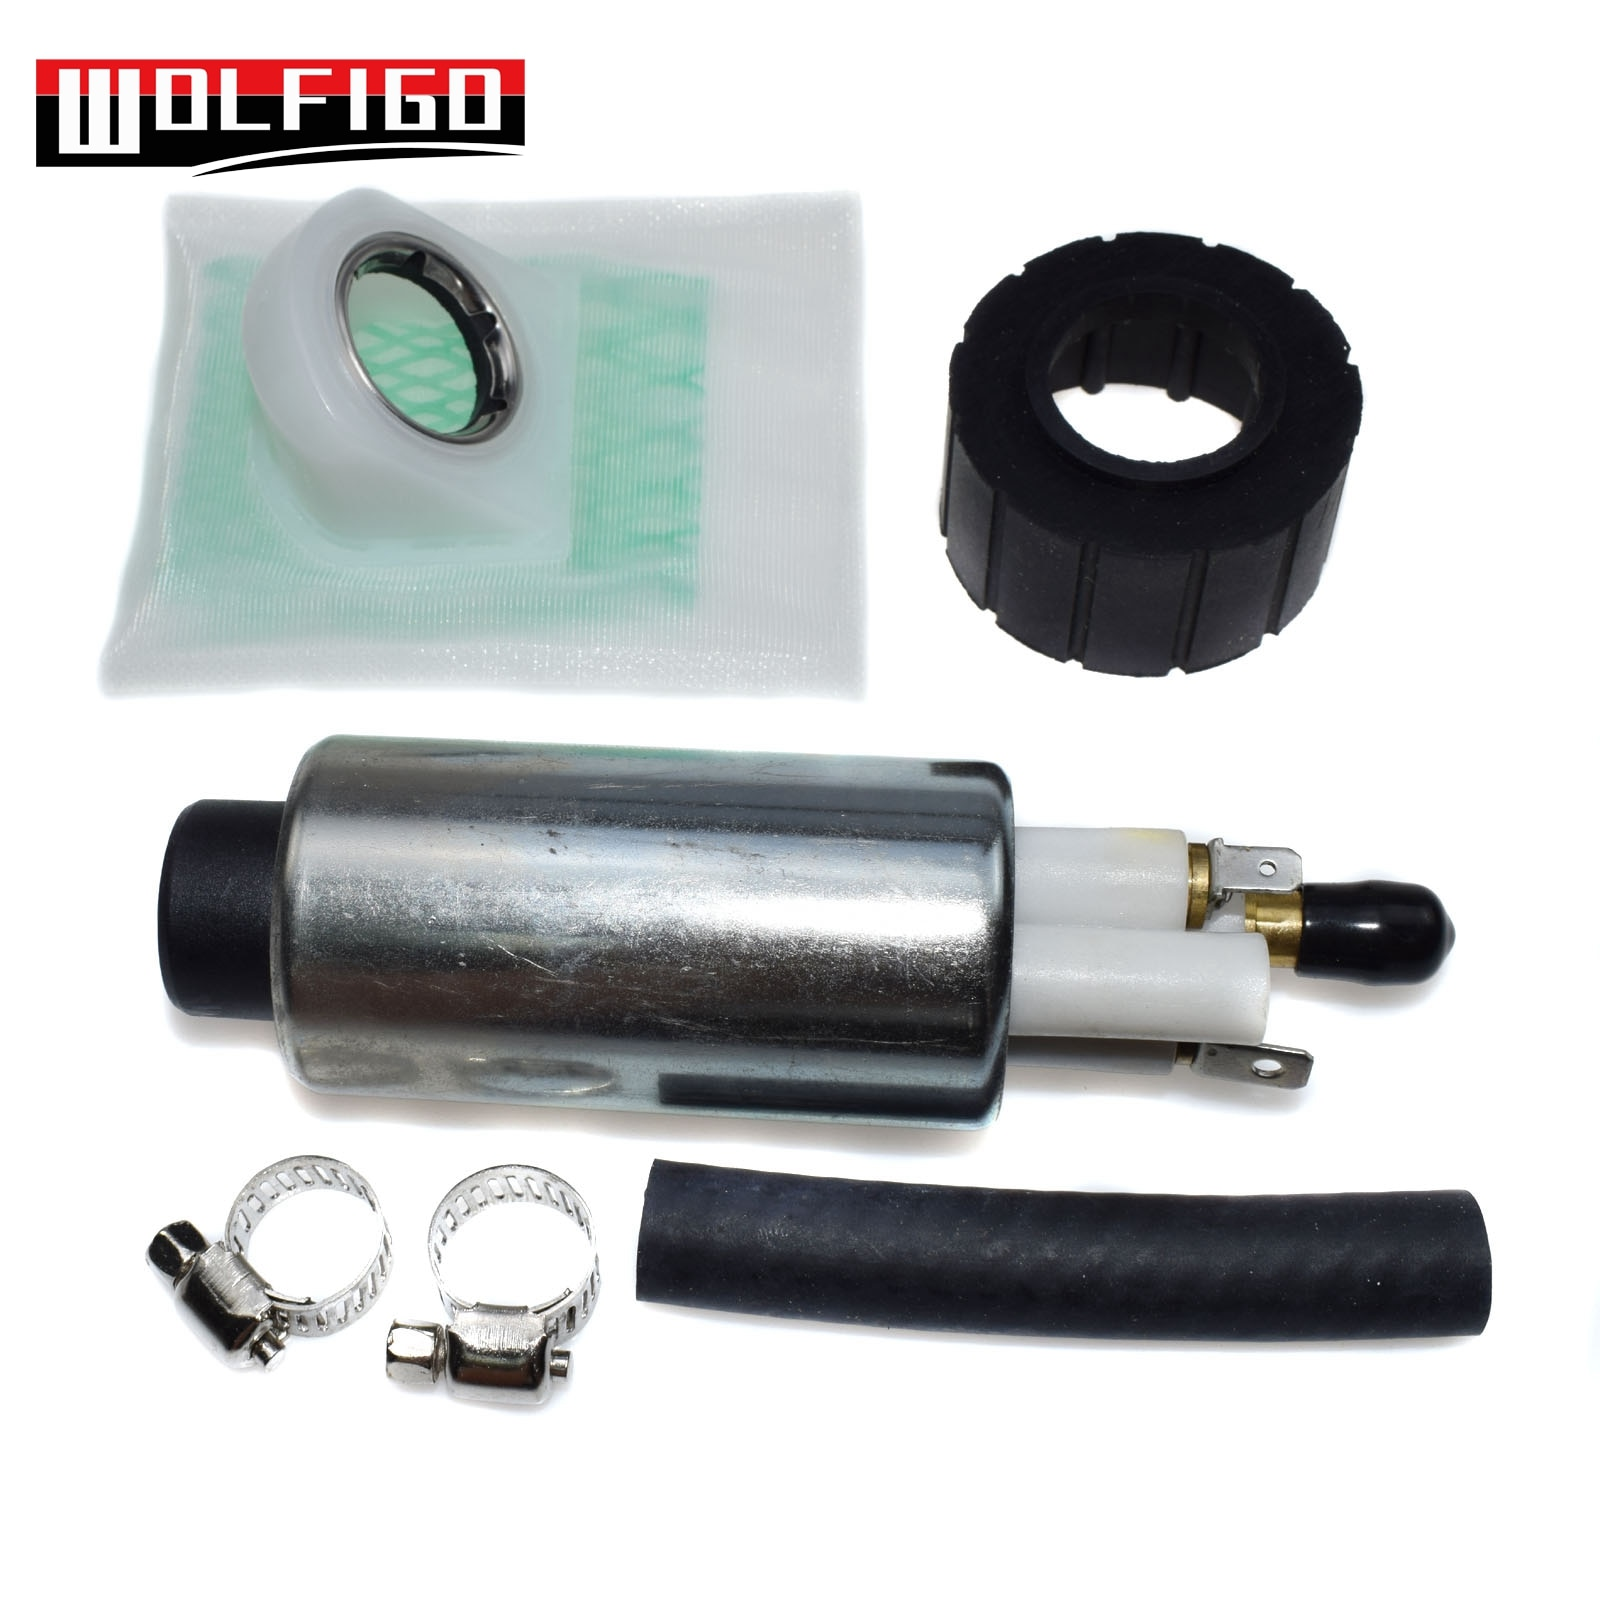 WOLFIGO ajuste Sportsman Polaris 500 700 800 ATV EFI 2005-2008 bomba de combustible Intank 324970, 151070